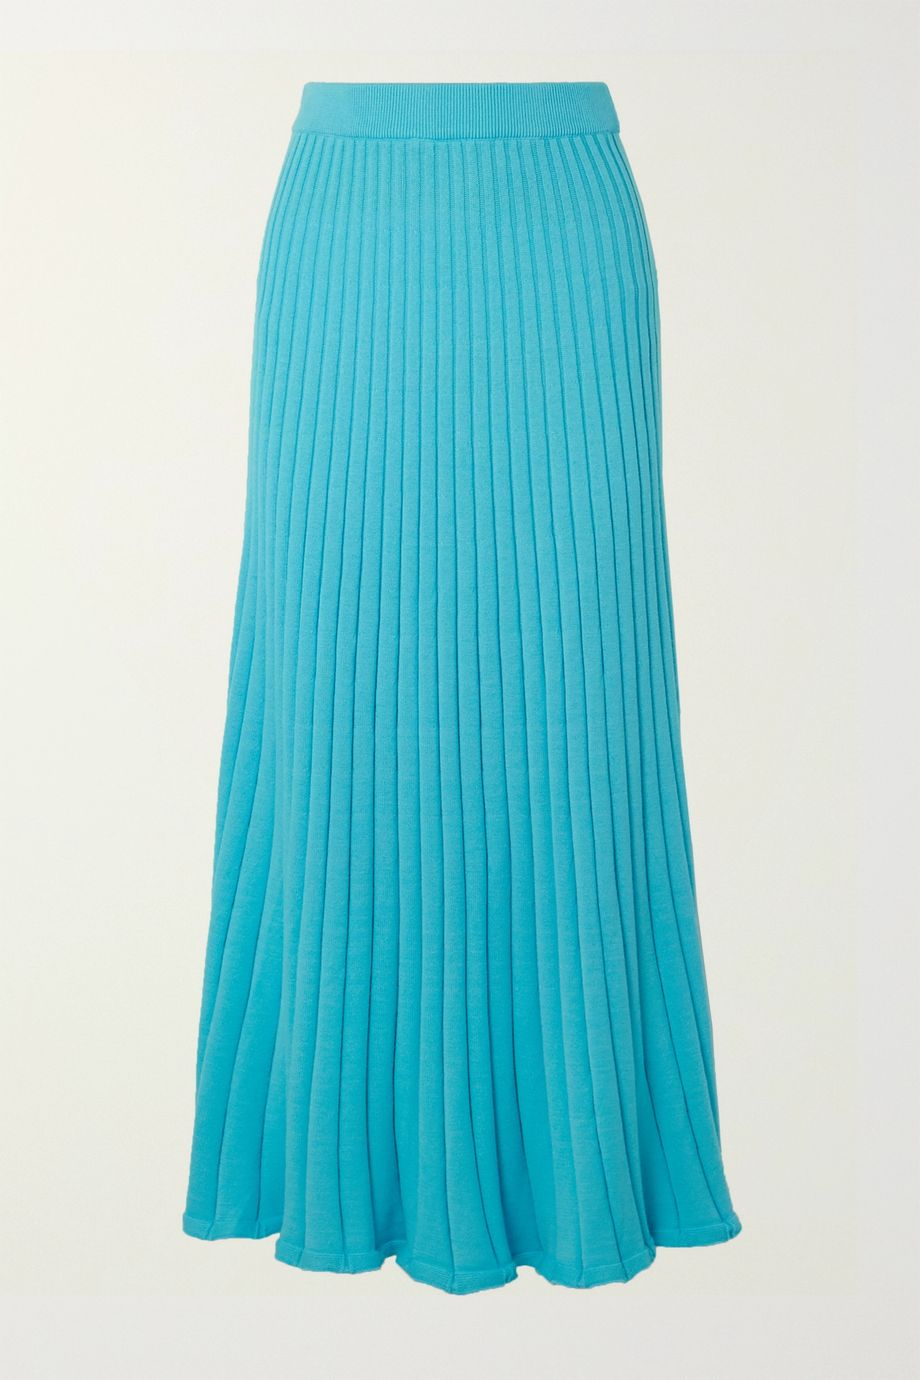 ANNA QUAN Lulu ribbed cotton maxi skirt